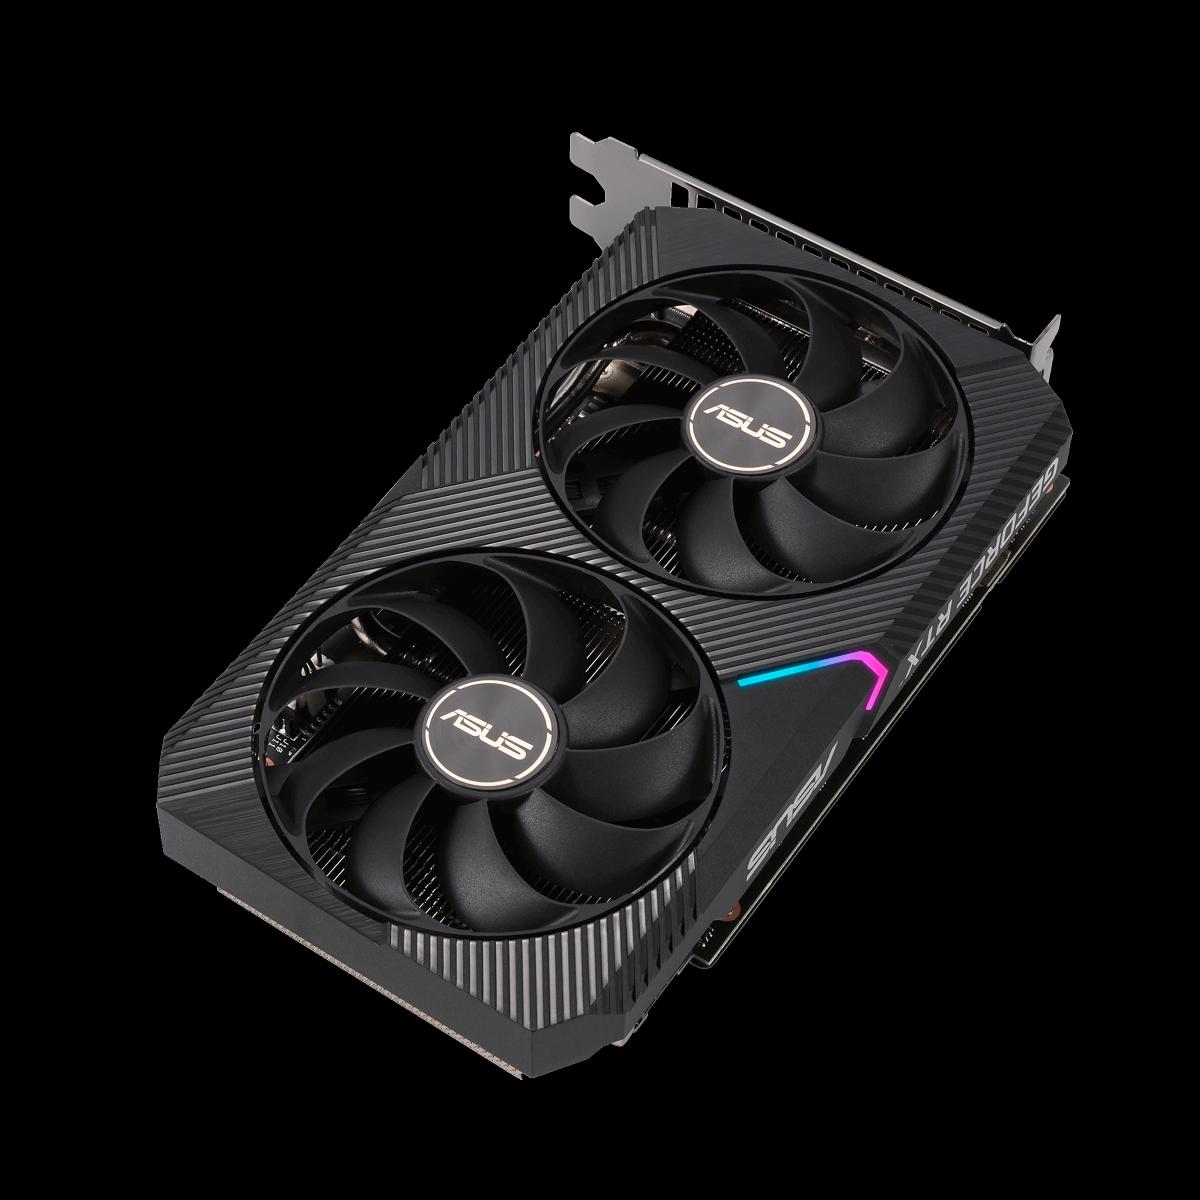 Placa de Vídeo Asus GeForce RTX 3060 Dual, 12GB, GDDR6, 192bit, DUAL-RTX3060-12G